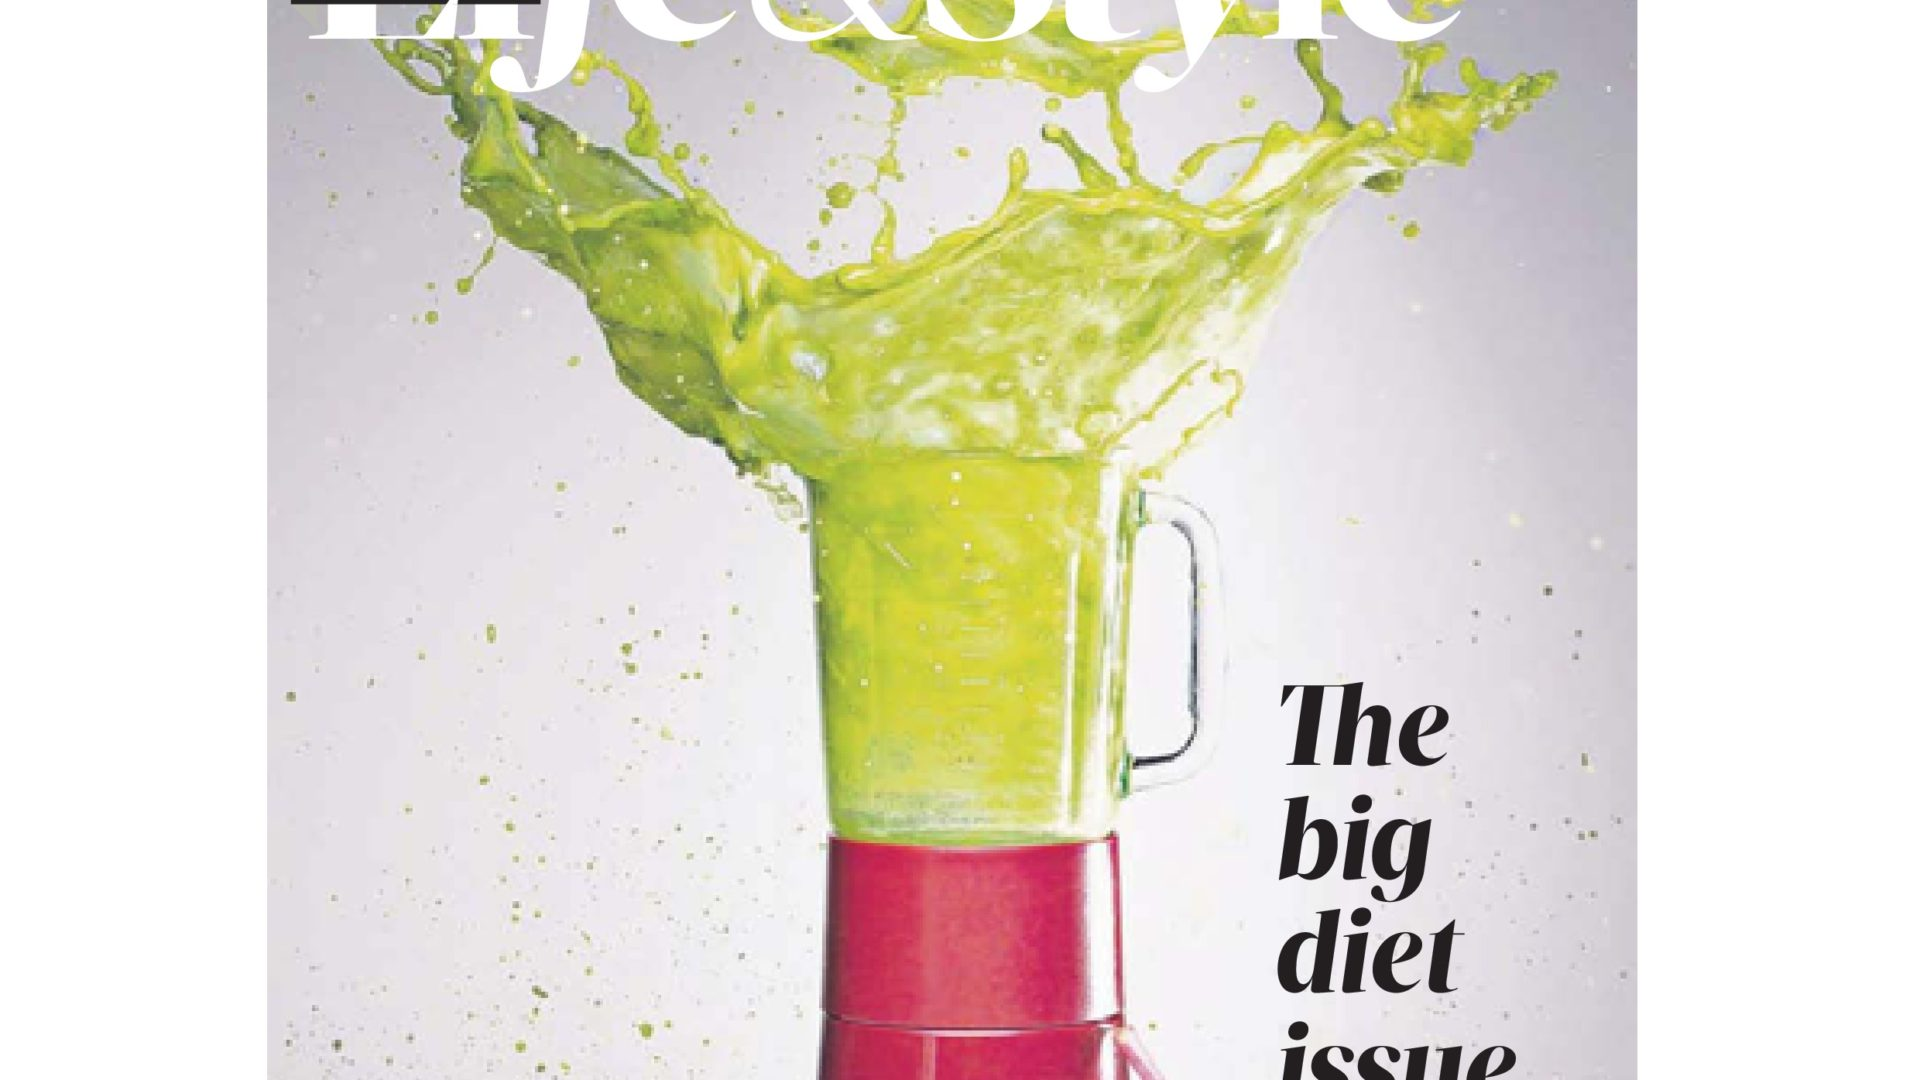 UK Metro Magazine March 24, 2014